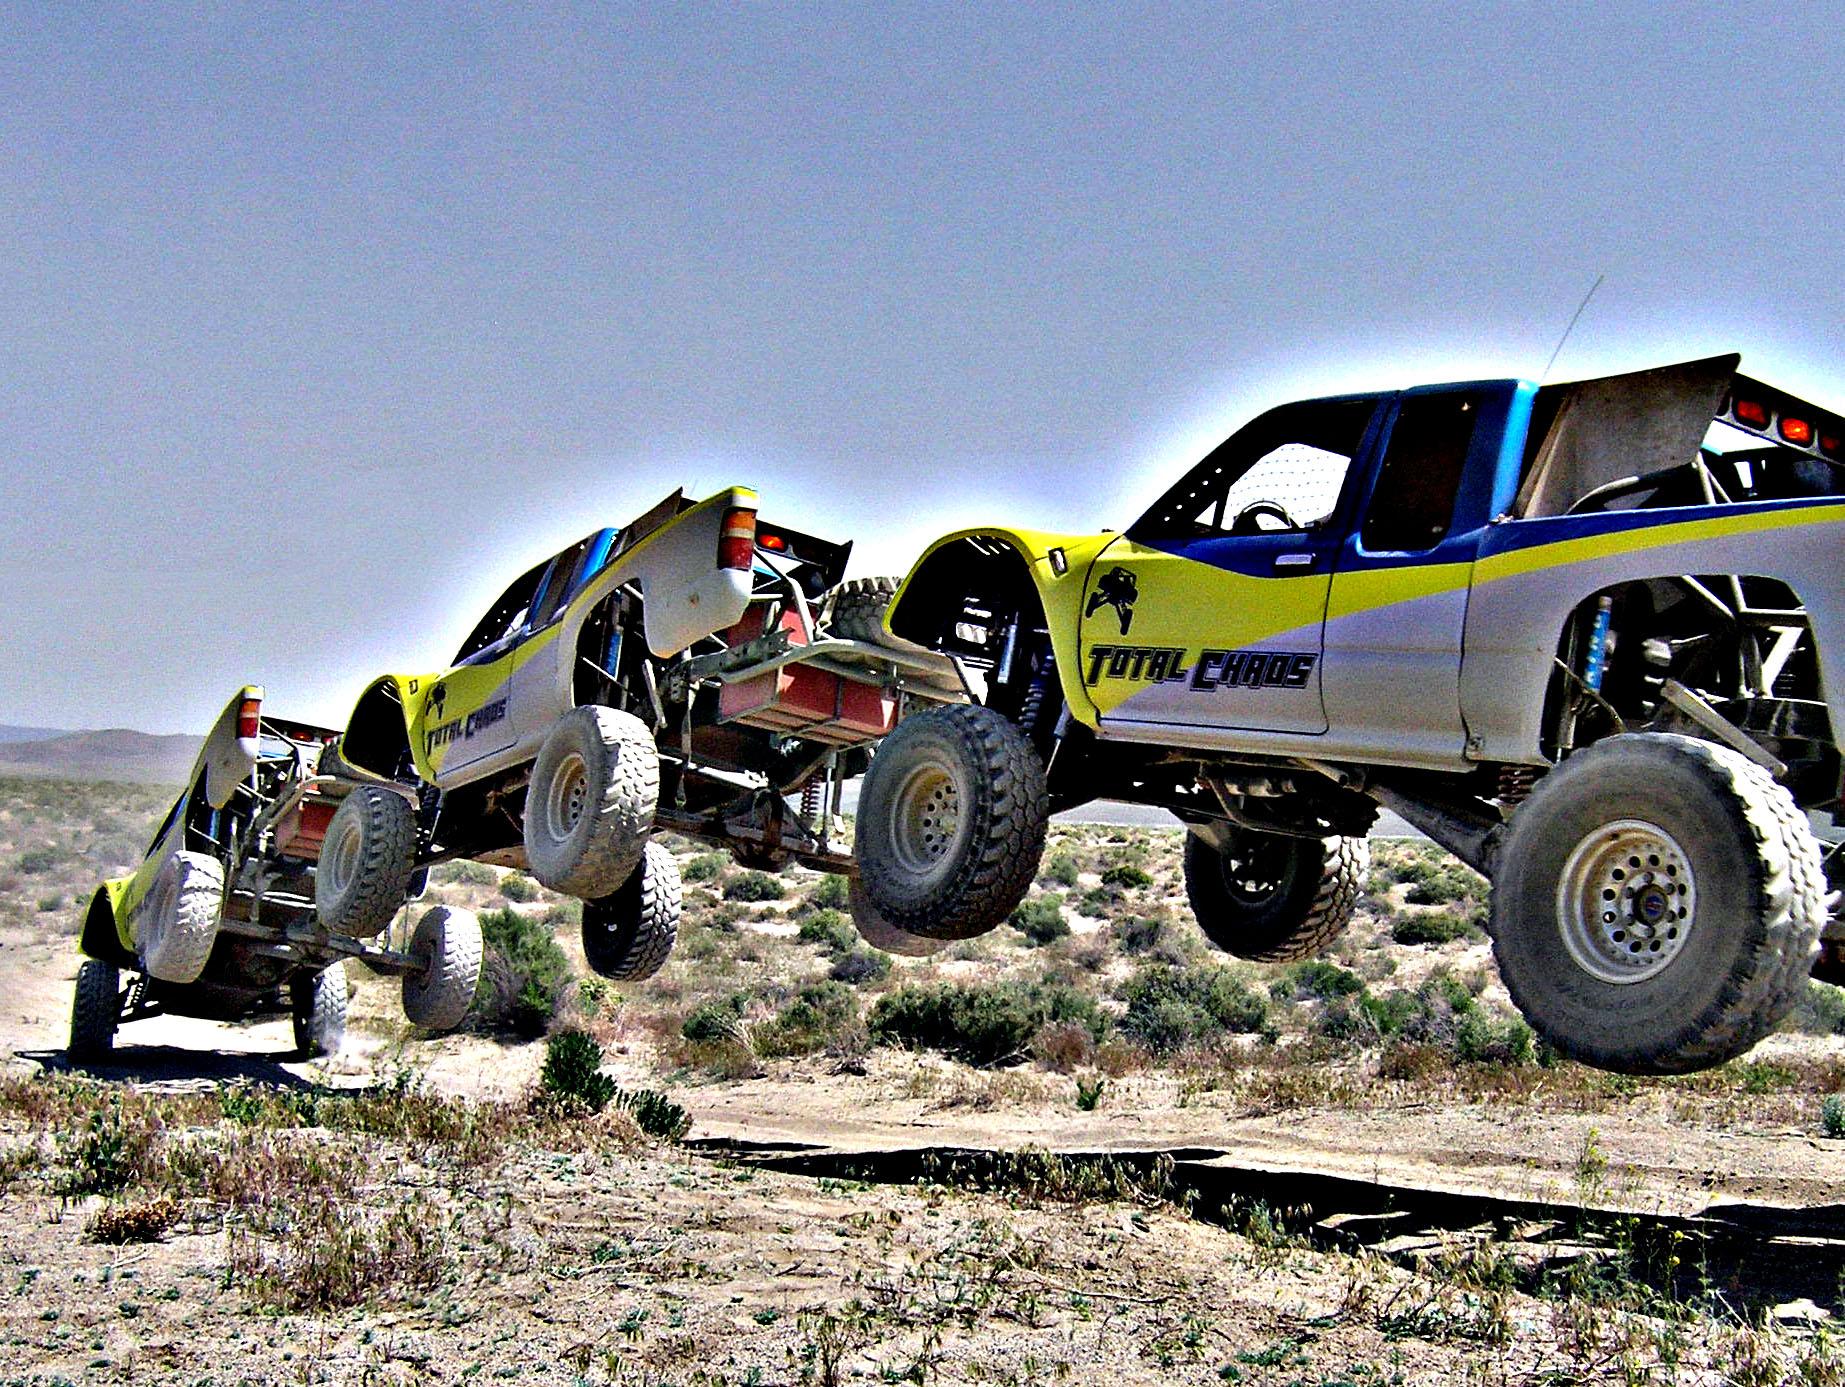 racetruck_edited-1.jpg